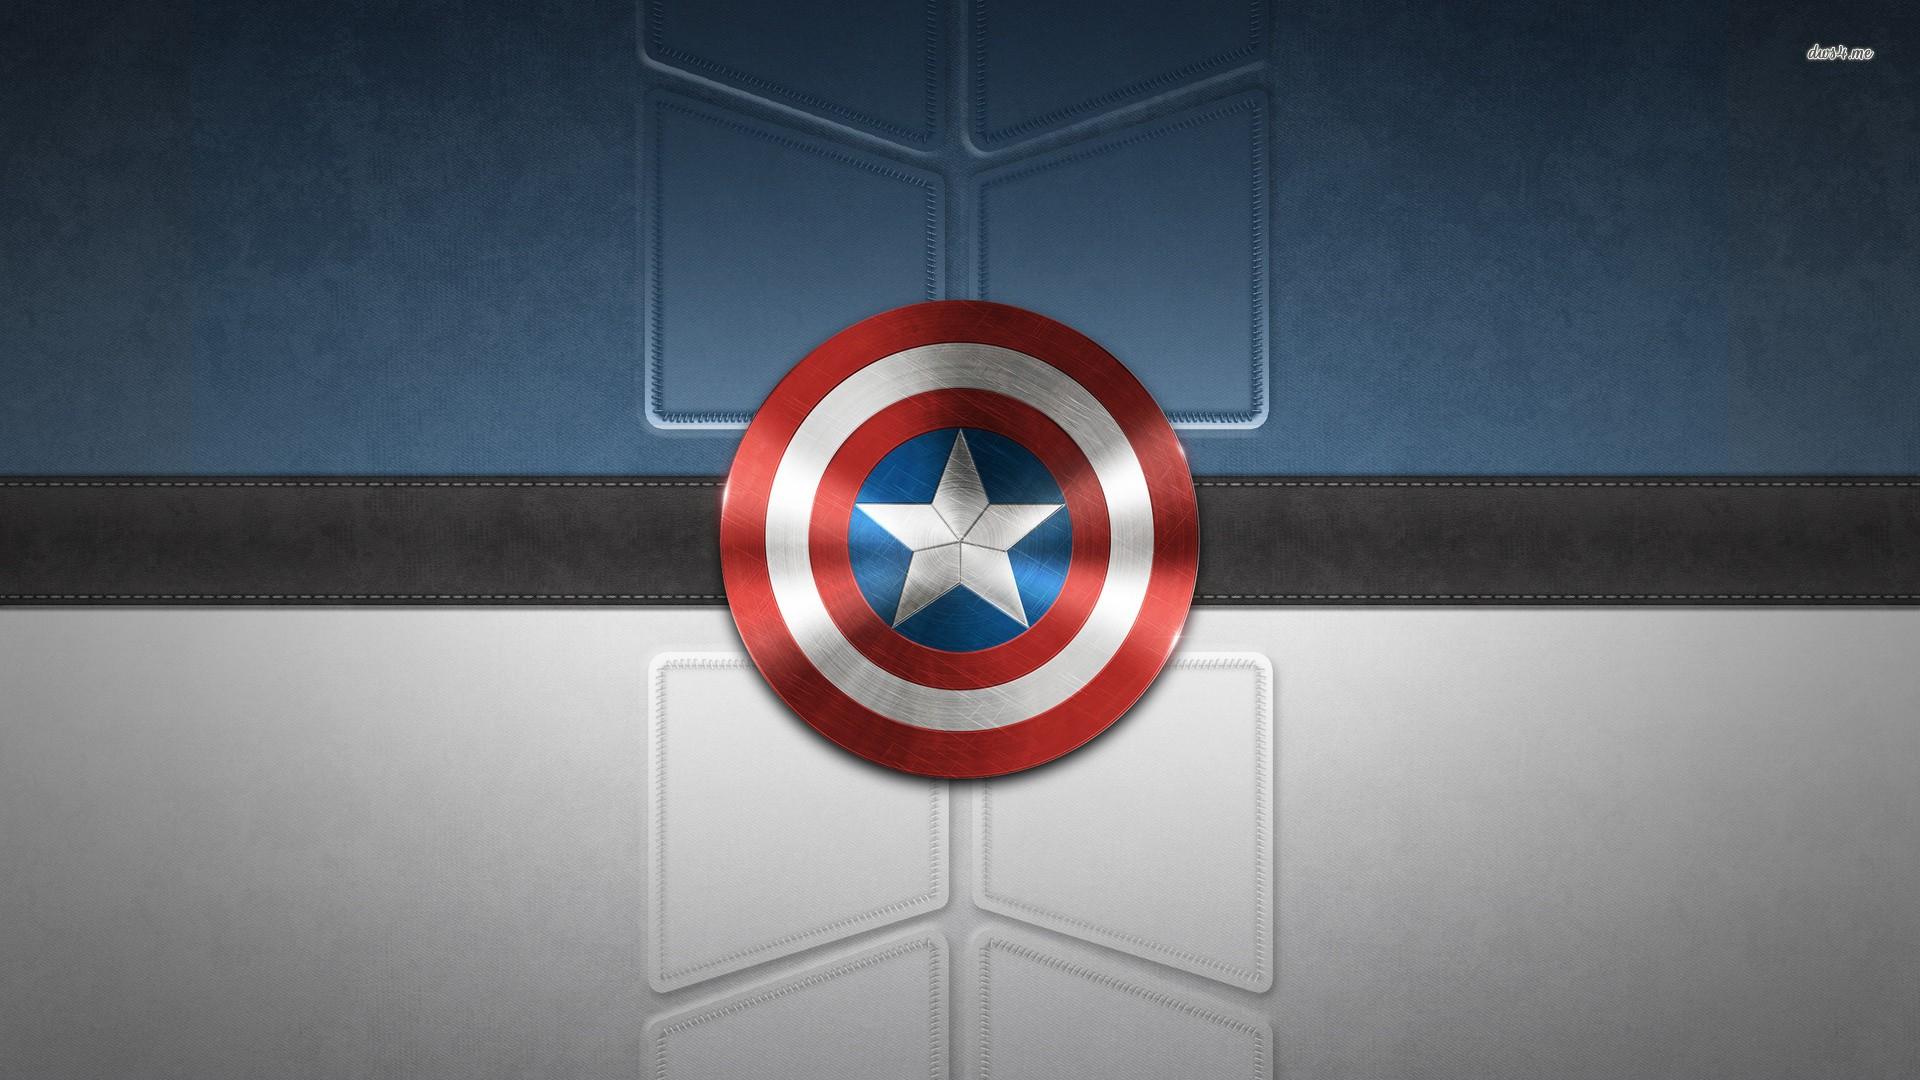 Captain America Shield Wallpaper Download Free Full Hd